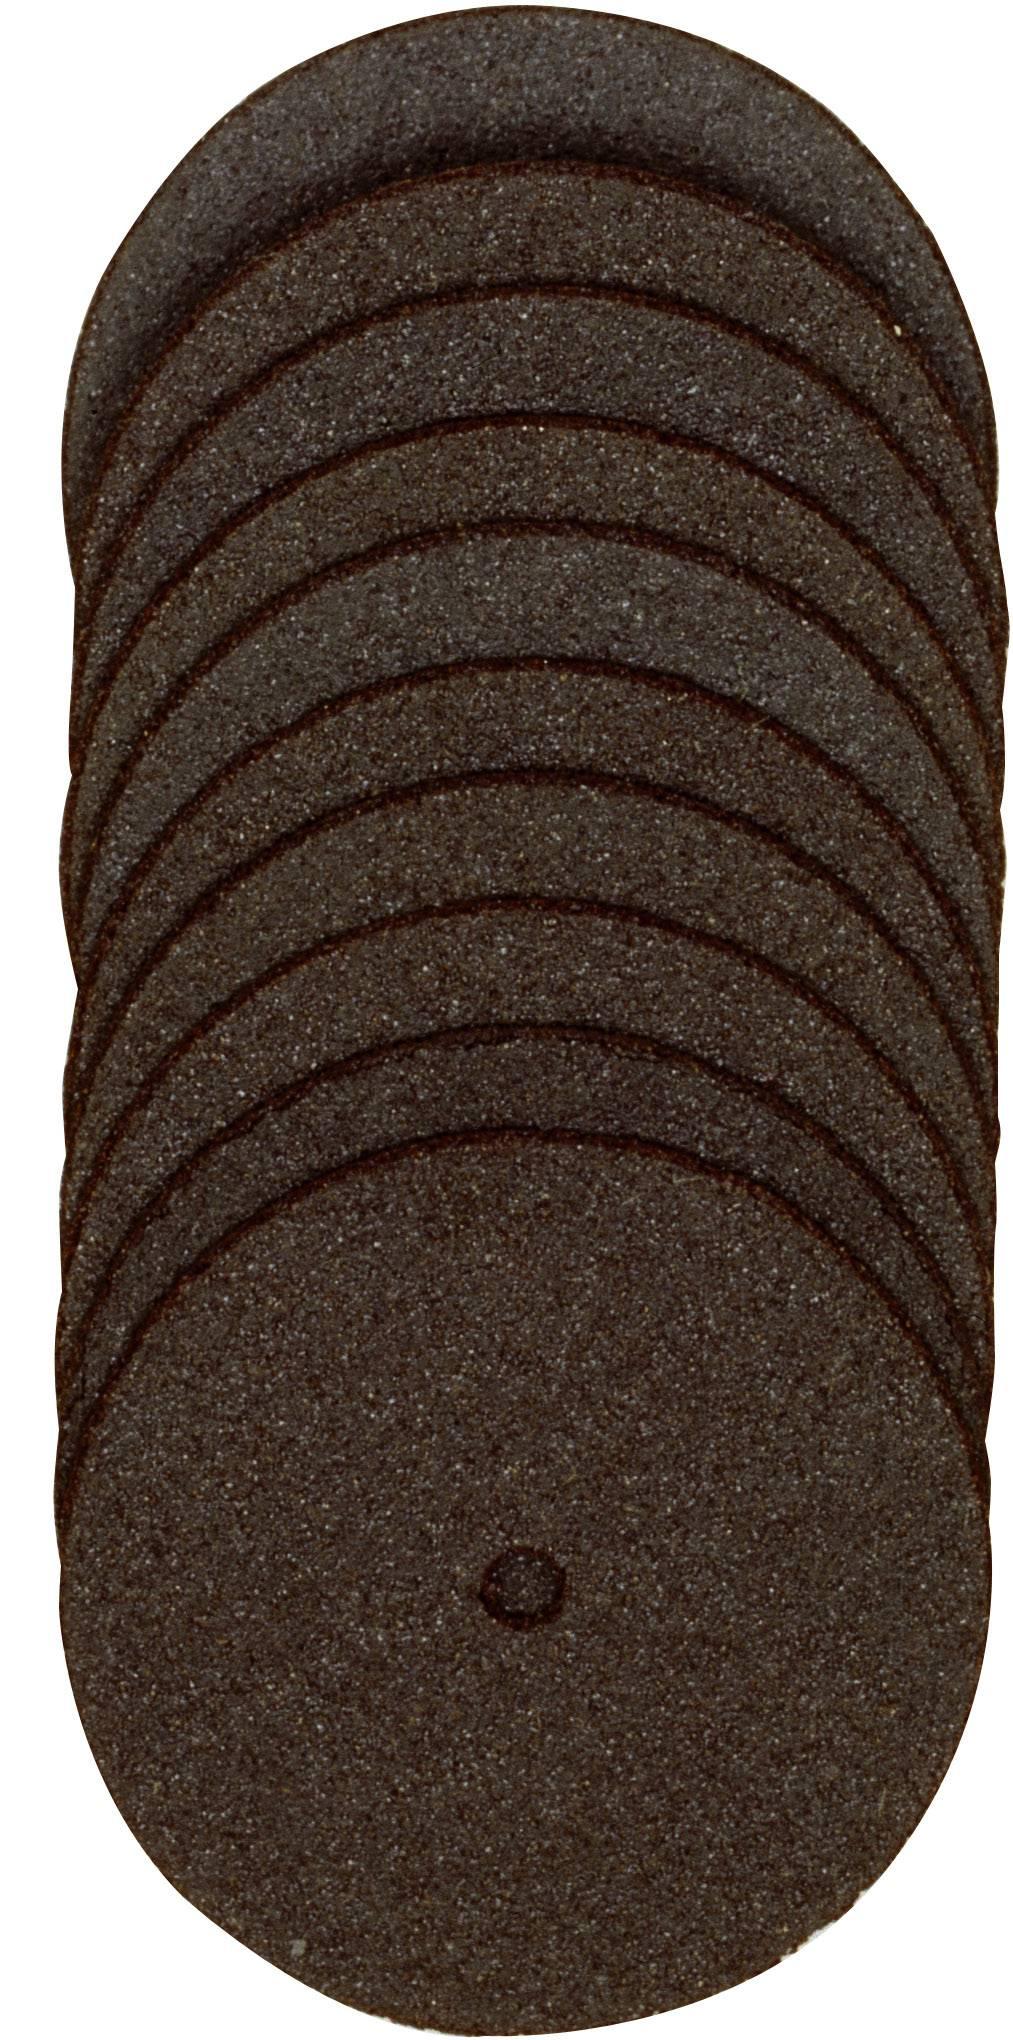 50 kotoucu tavné pily Ř 22 x 0 ,7 mm